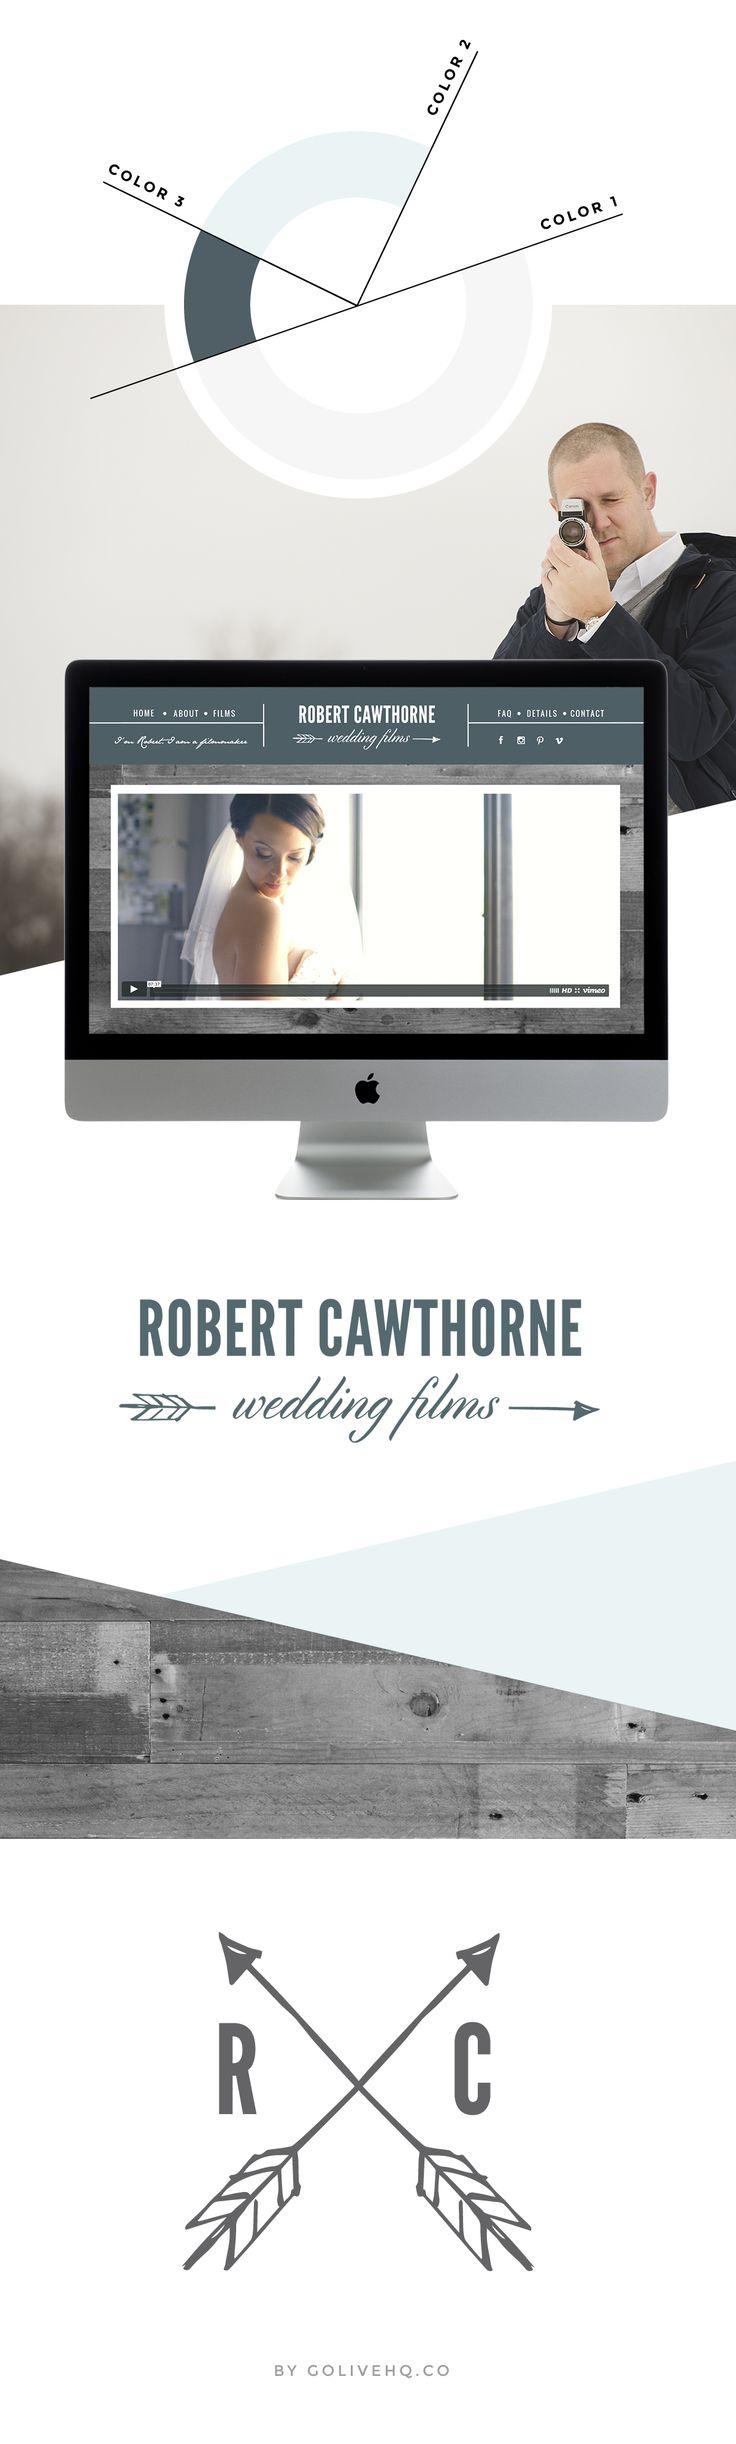 Robert Cawthorne Wedding Films branding and web design | www.weddingfilmsbyrobert.com